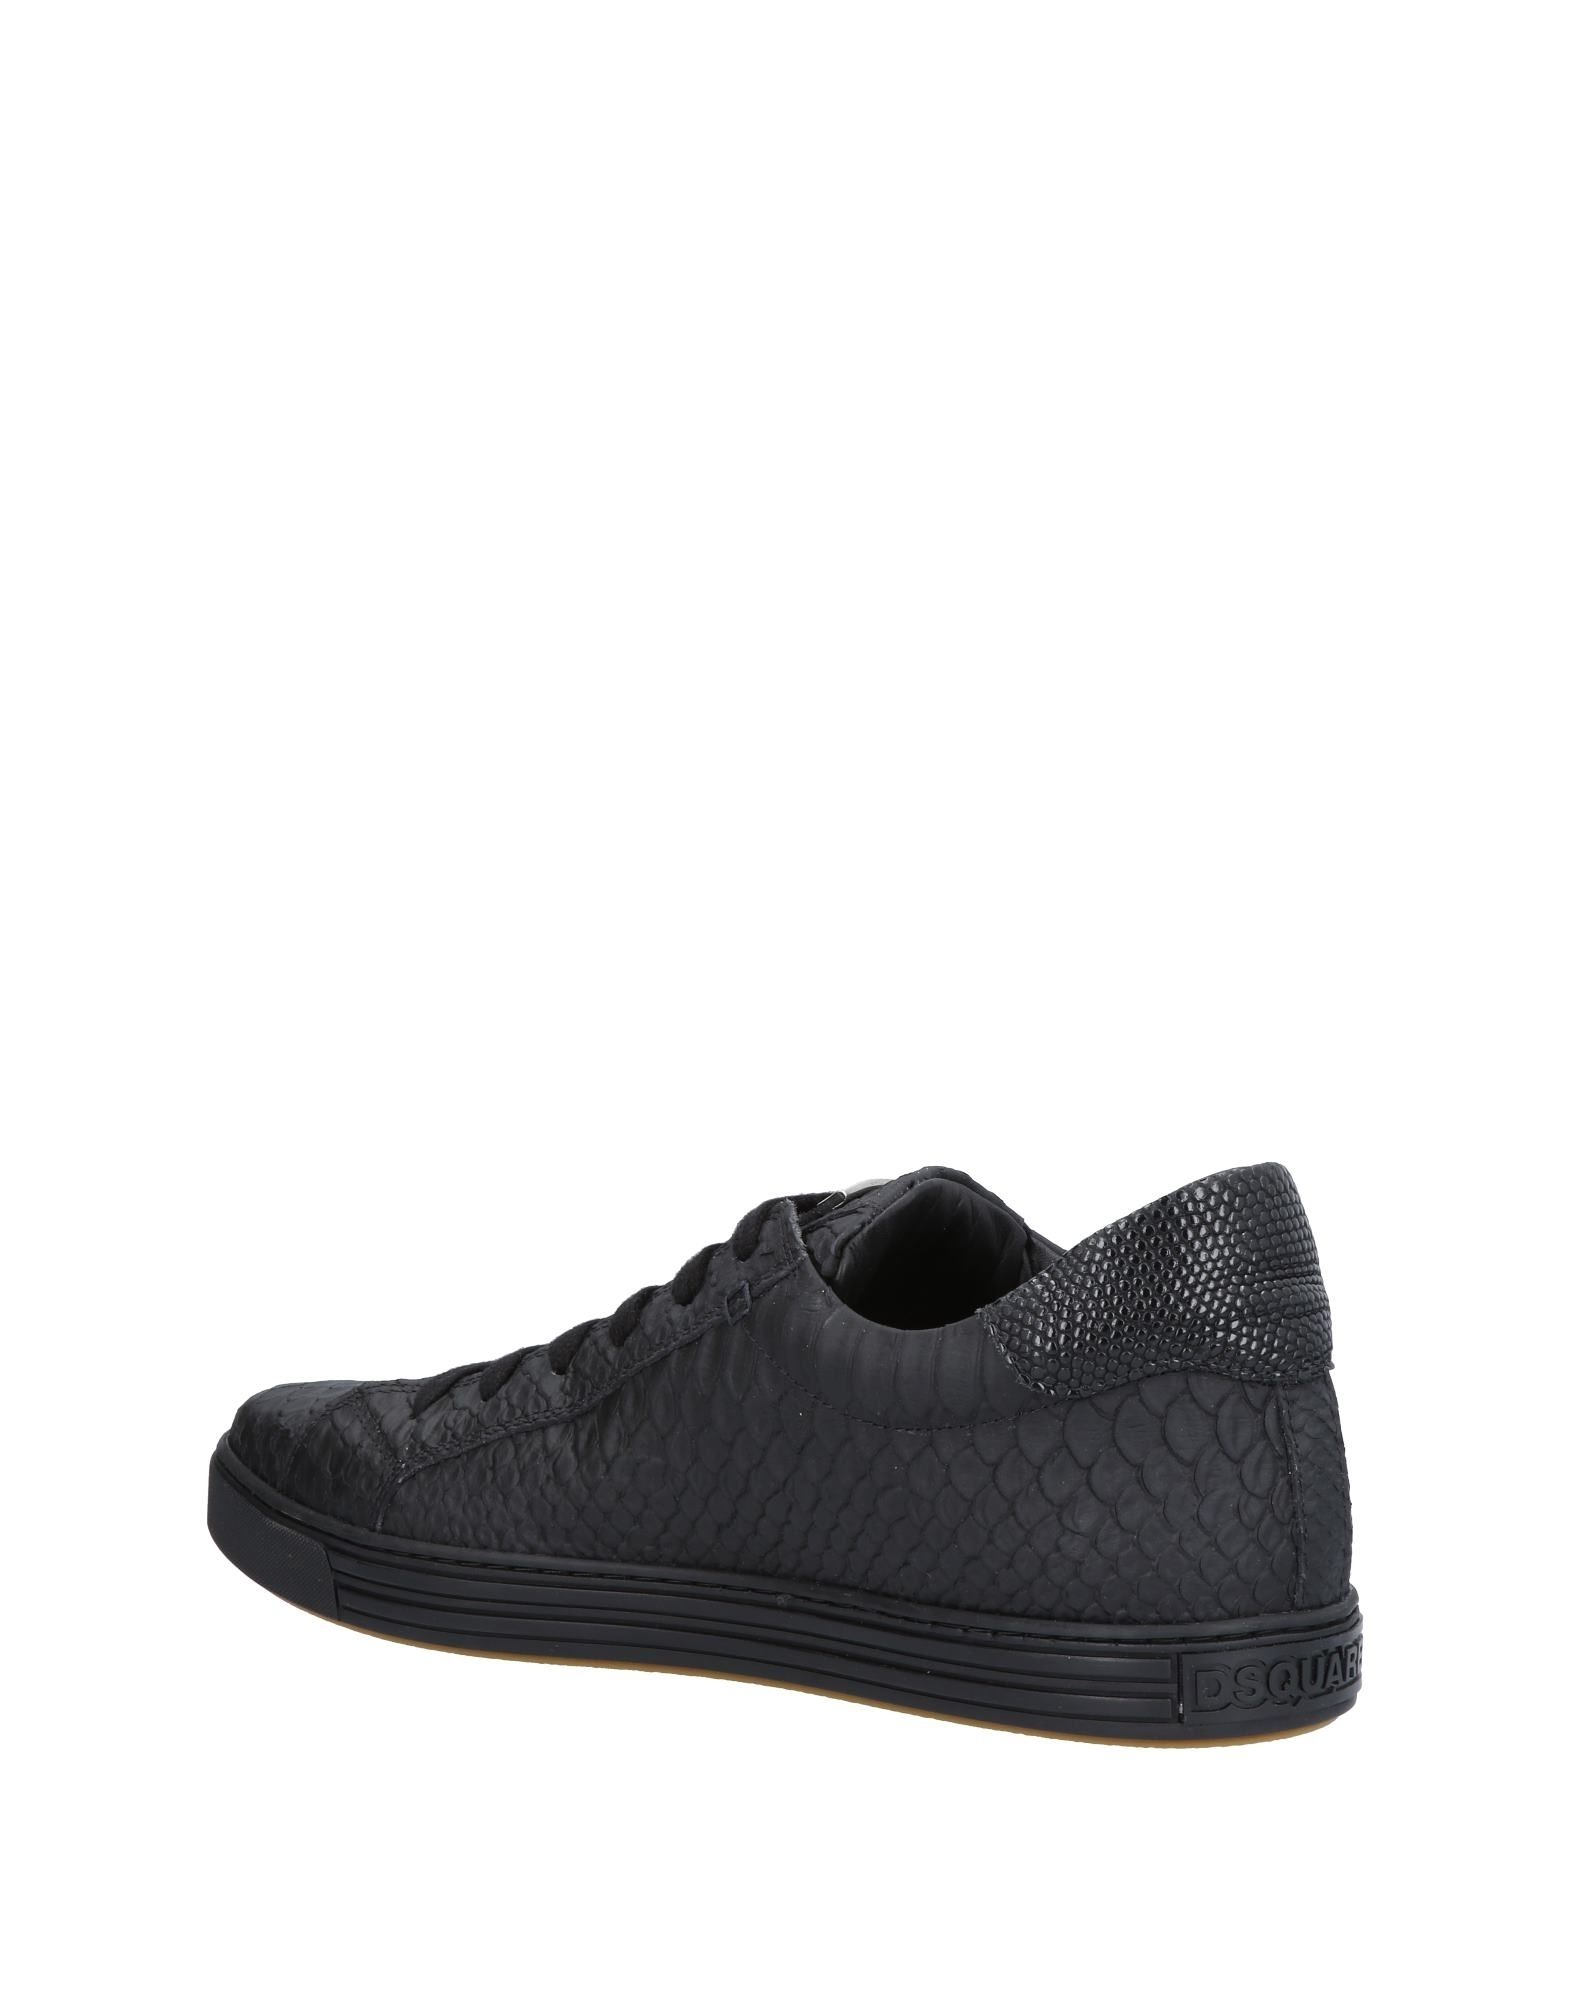 Dsquared2 Gute Sneakers Herren  11482317XR Gute Dsquared2 Qualität beliebte Schuhe 63b8e4